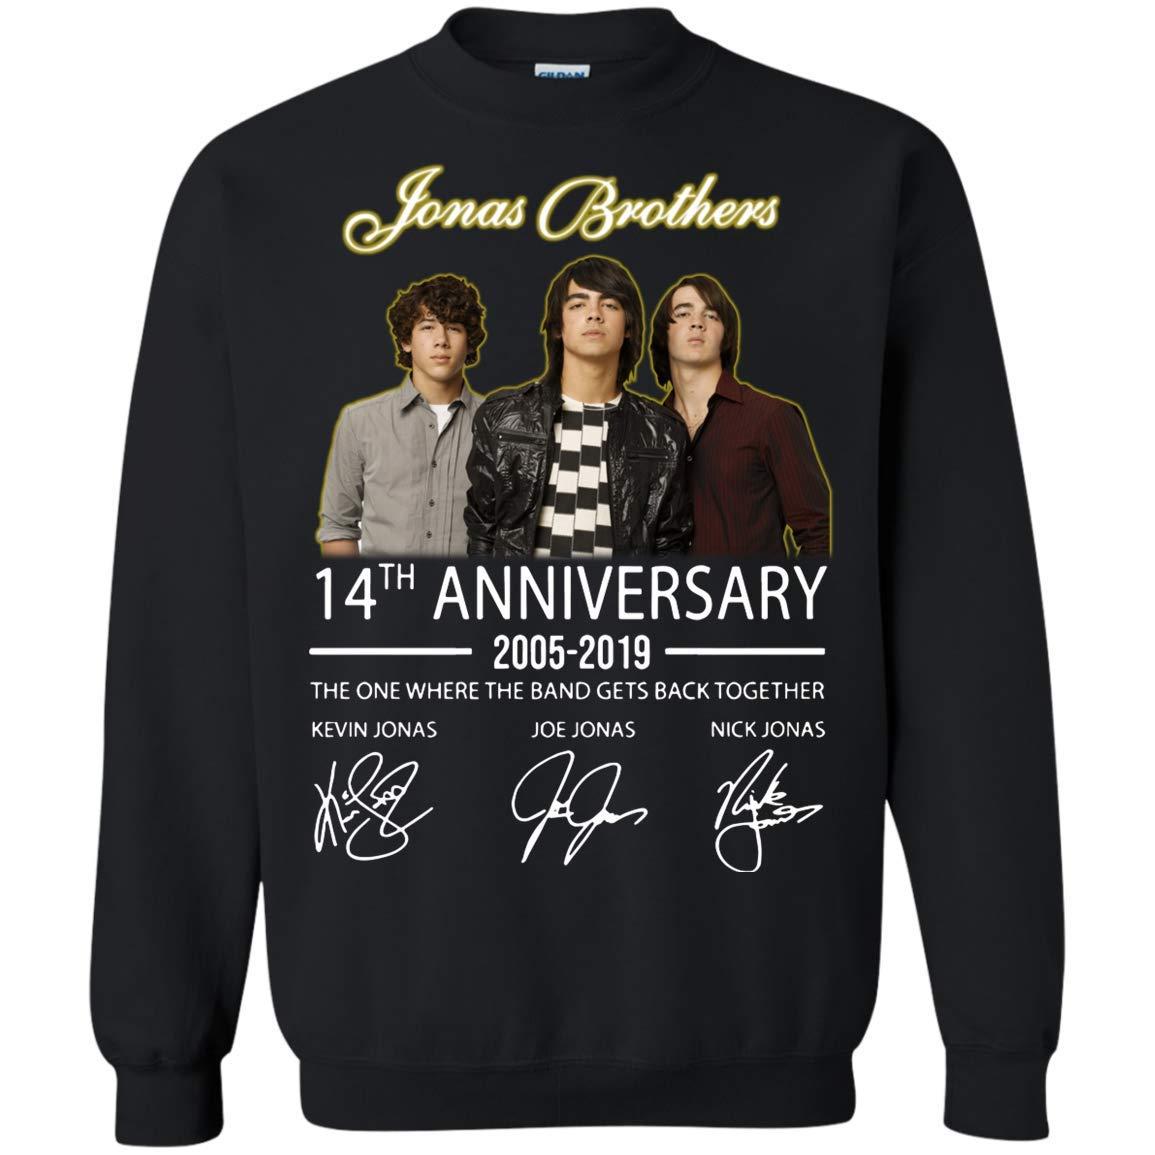 Jonas Brothers 14th Anniversary For Idea For Fan Who Love Jonas Brothers Shirts